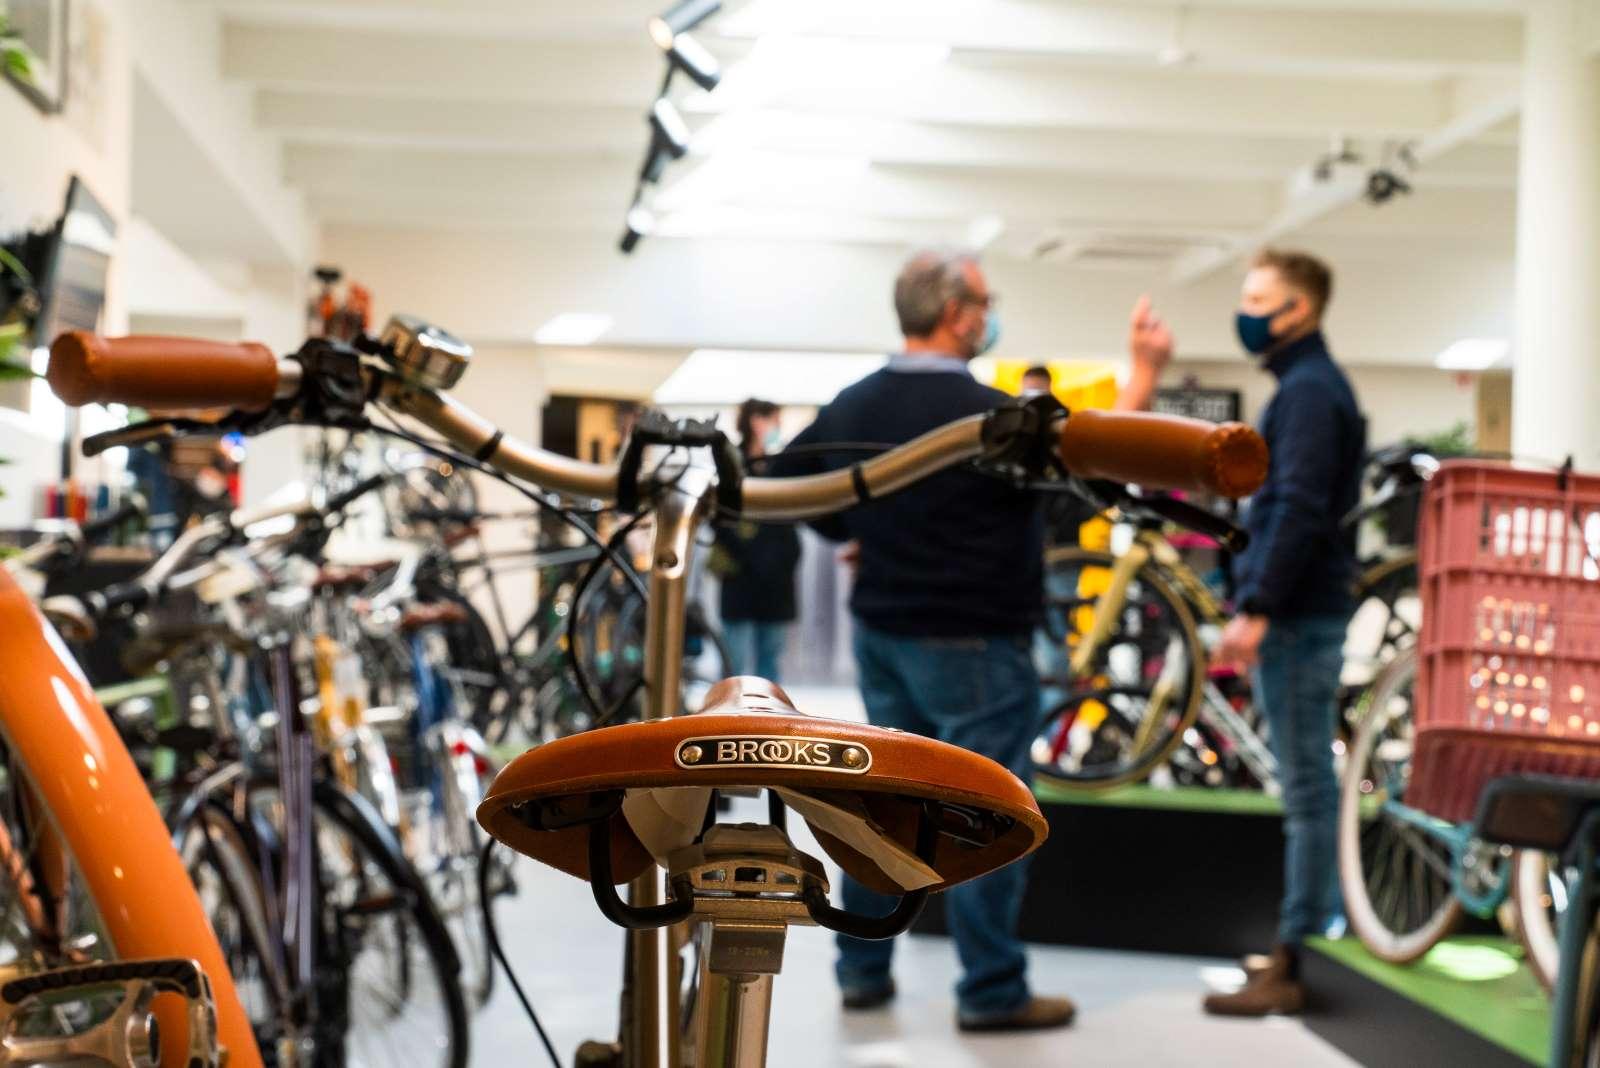 Brooks fietsen kopen Edegem, Antwerpen, Berchem